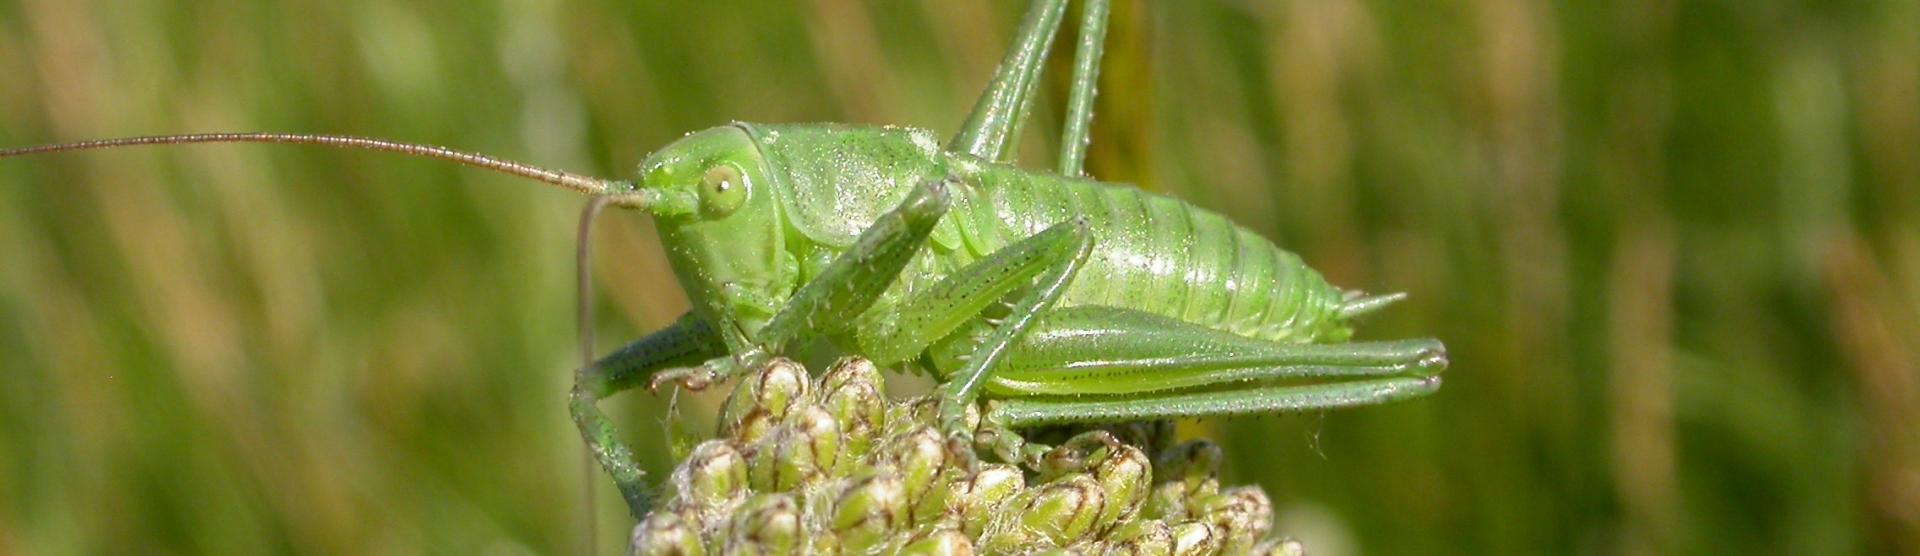 Great_green_bush_Cricket